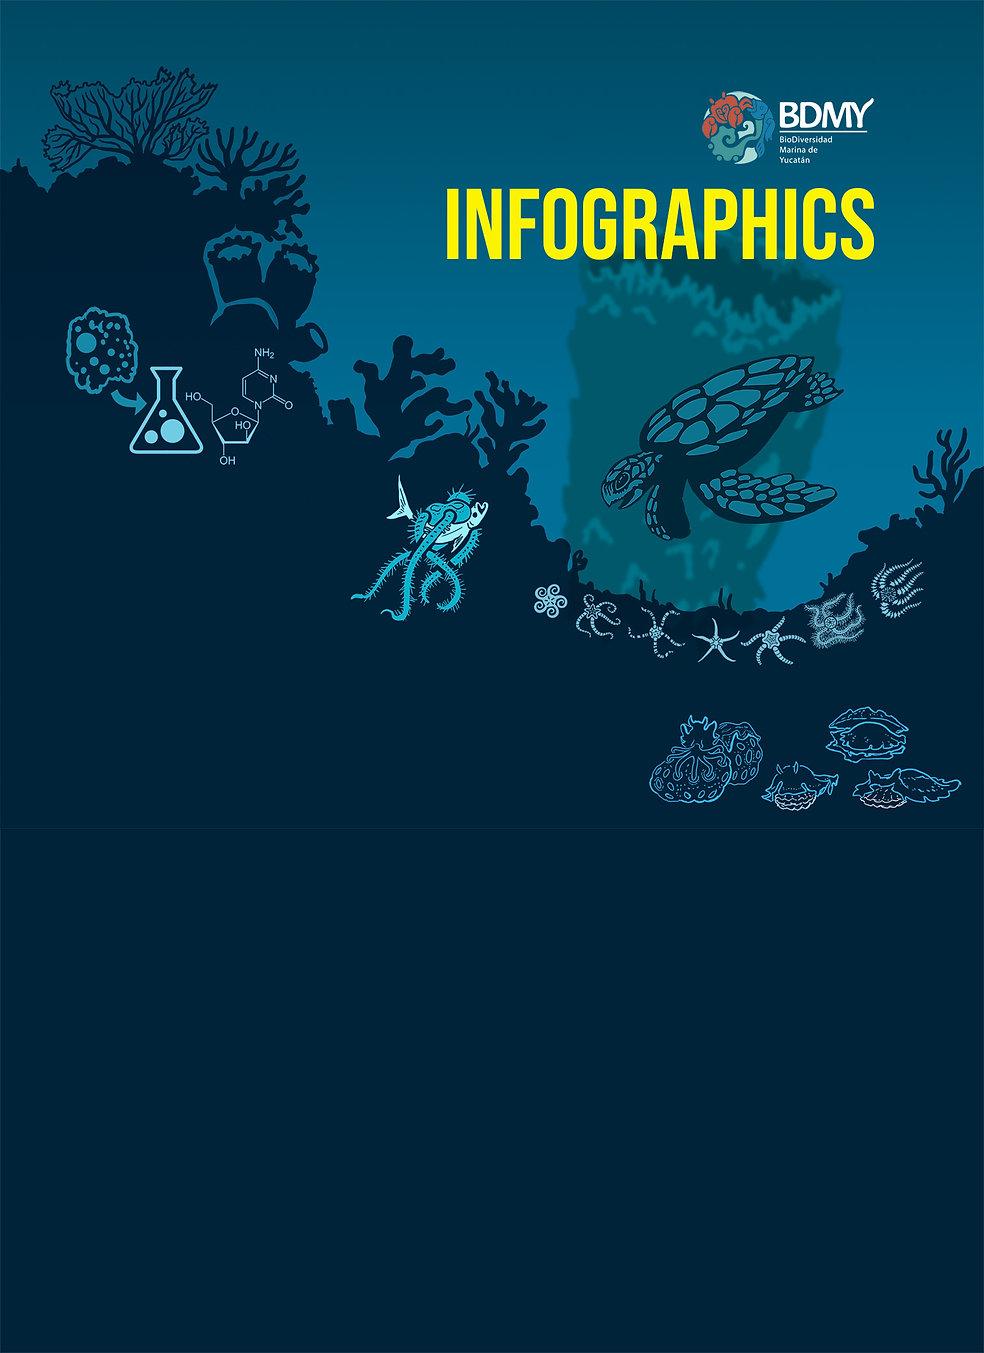 Landin-page-Infographics.jpg